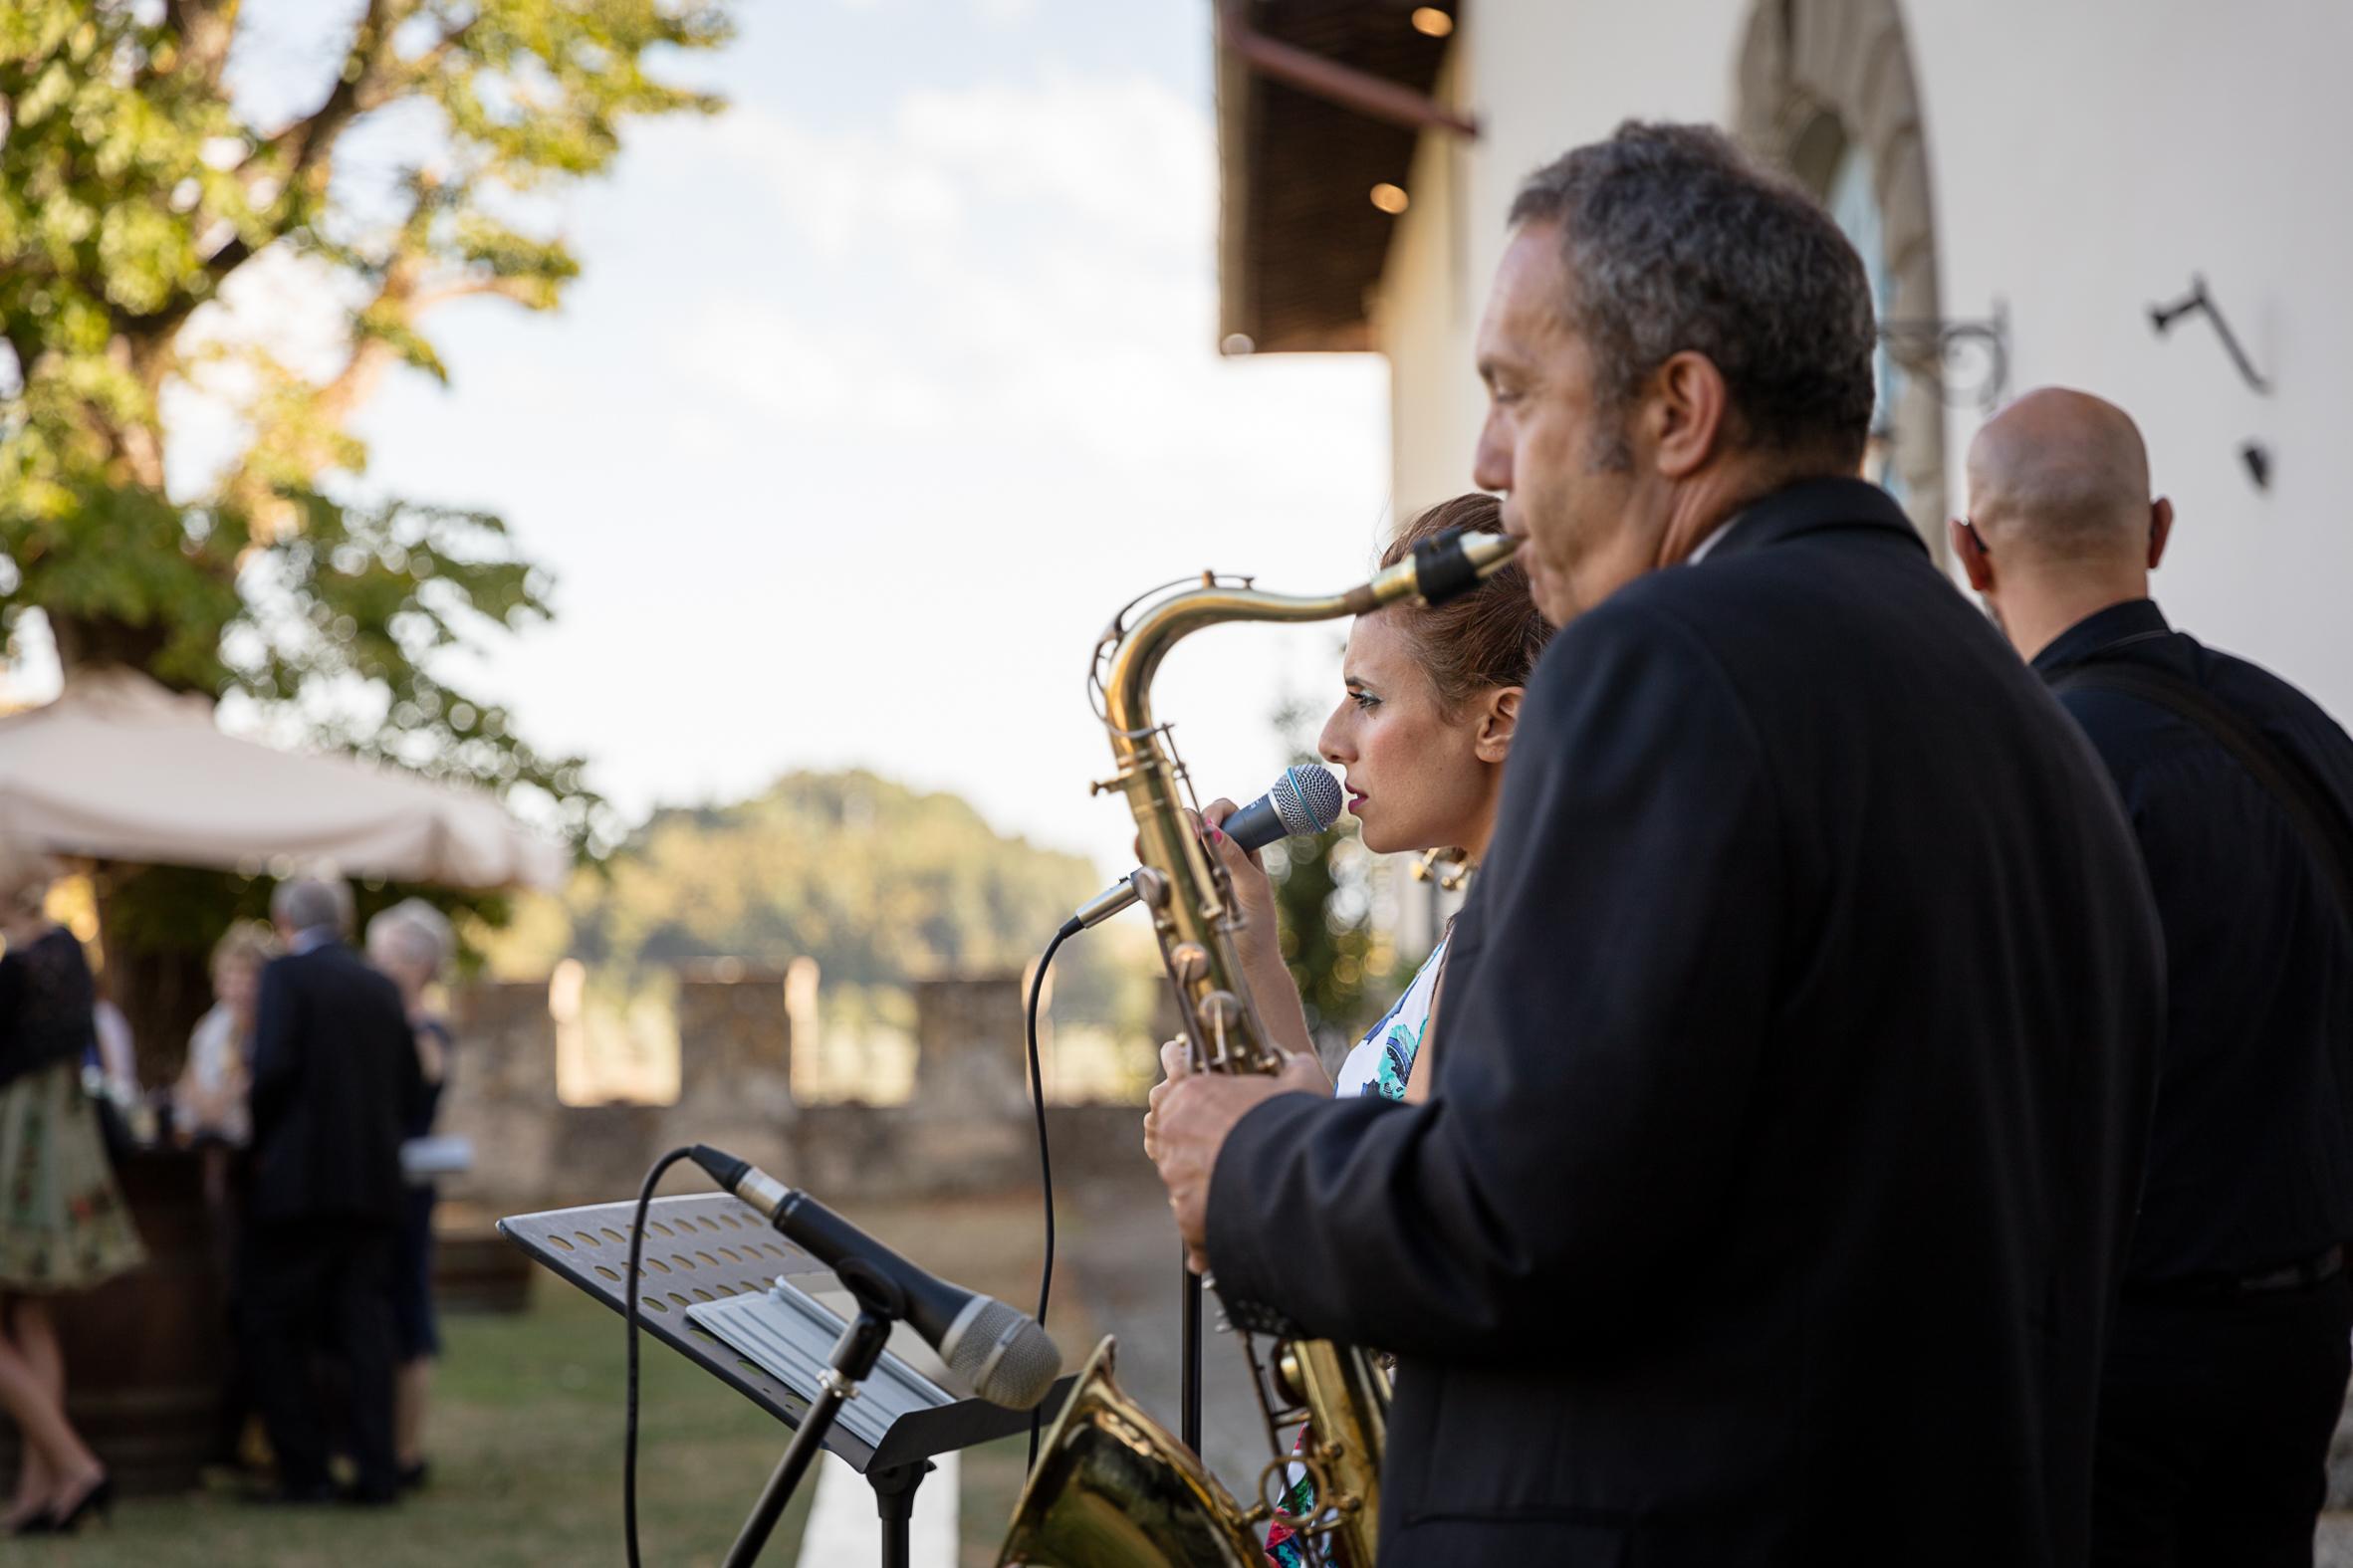 Hochzeit Andrea und Dario_Toskana 2017_167_a4.jpg